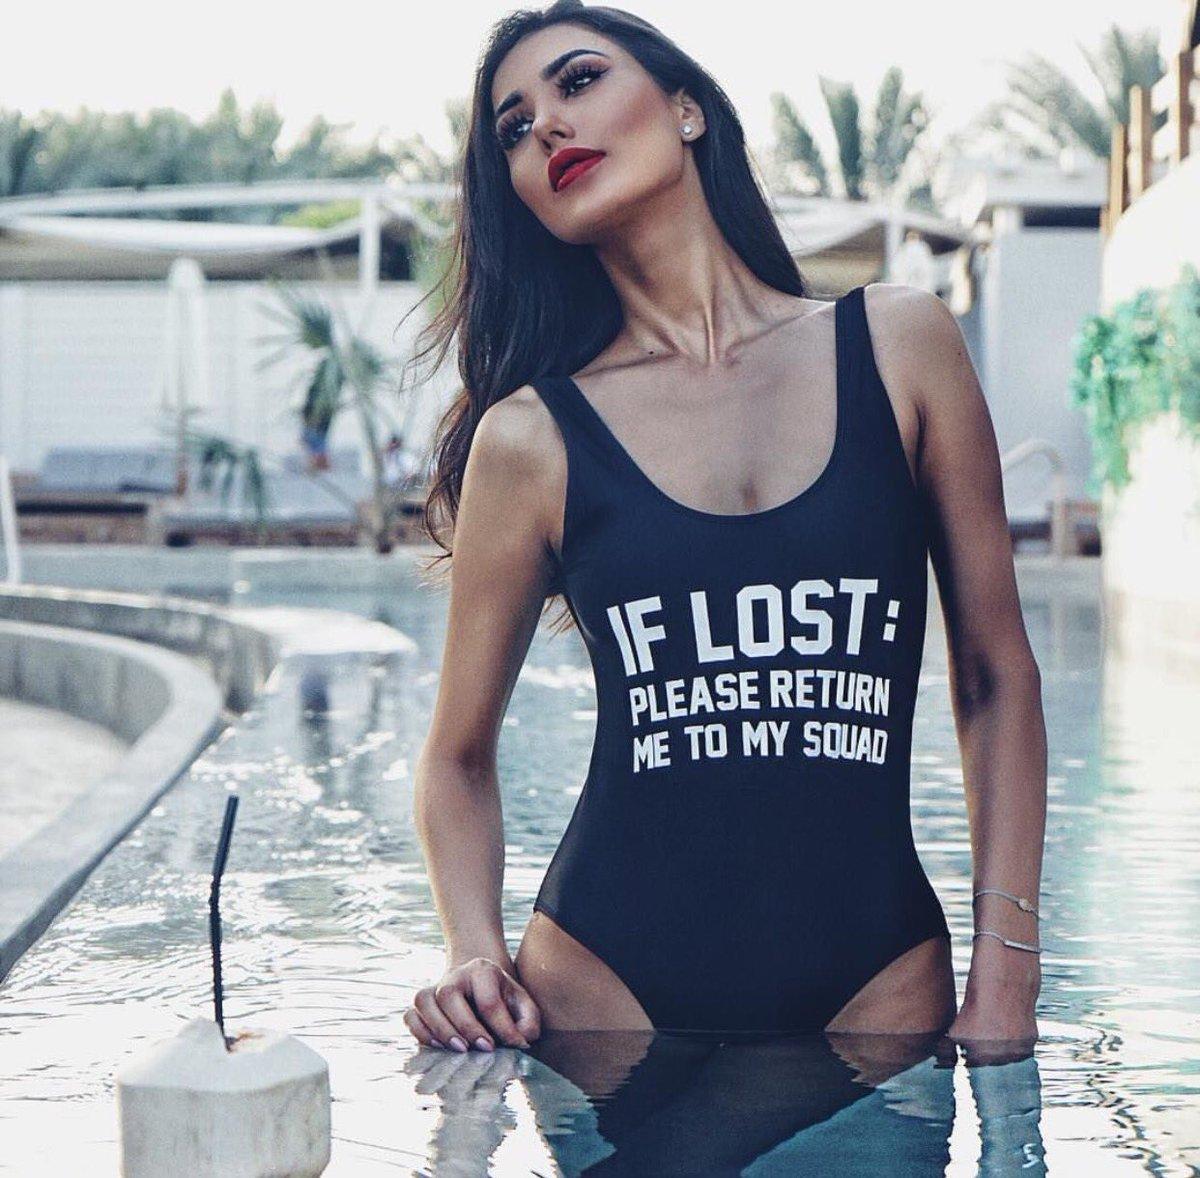 Profil Model Beirut Nadine Abdel Azis yang Seksi